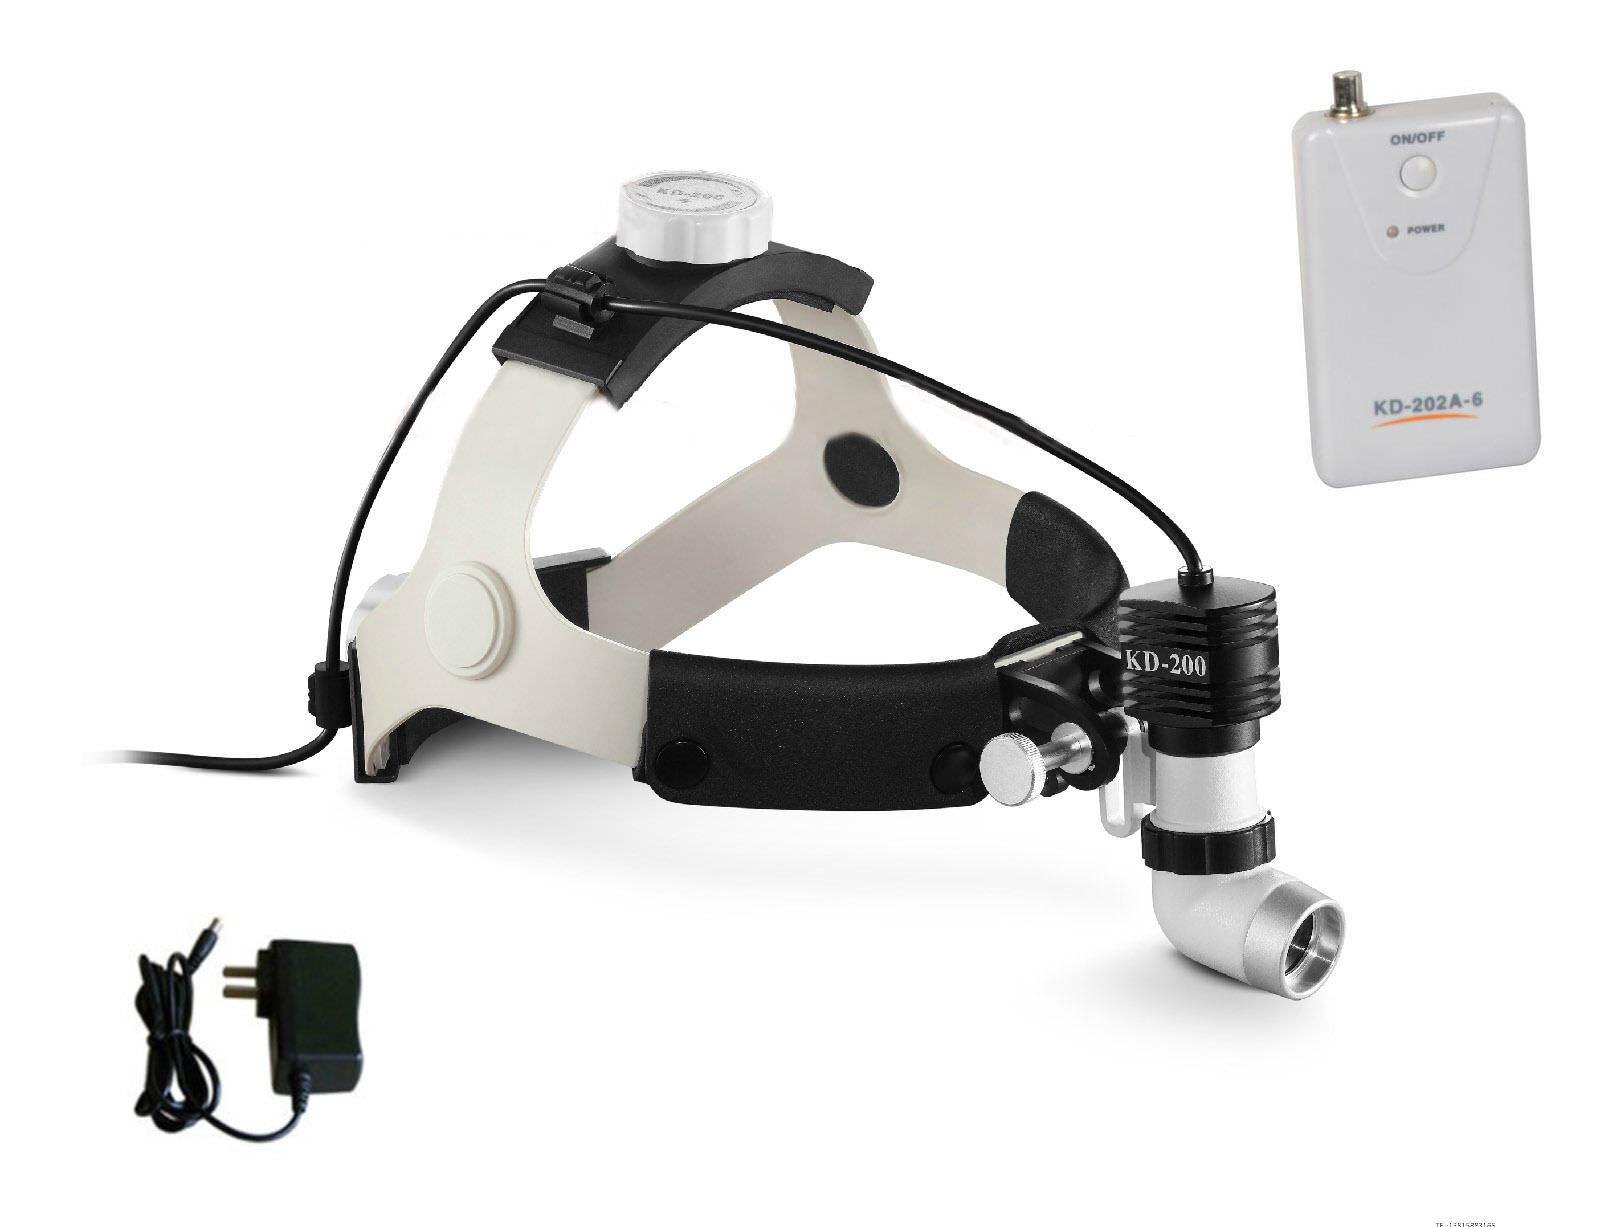 5W 6000K 80000lx LED Surgical Headlight Super-bright Medical Dental Head Lamp UK 2